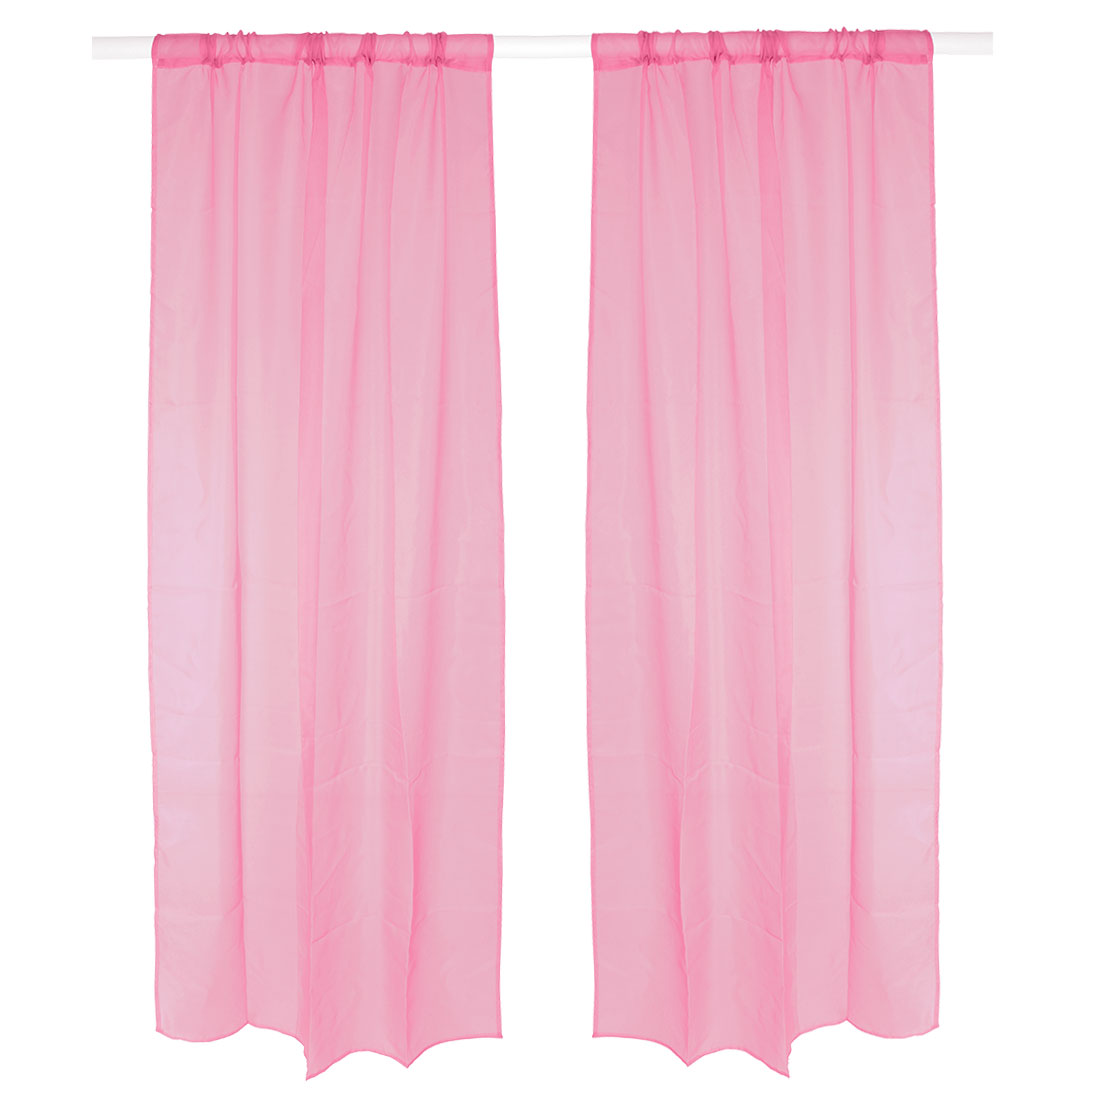 Bedroom Background Divider Panel Window Sheer Curtain Light Pink 100 x 200cm